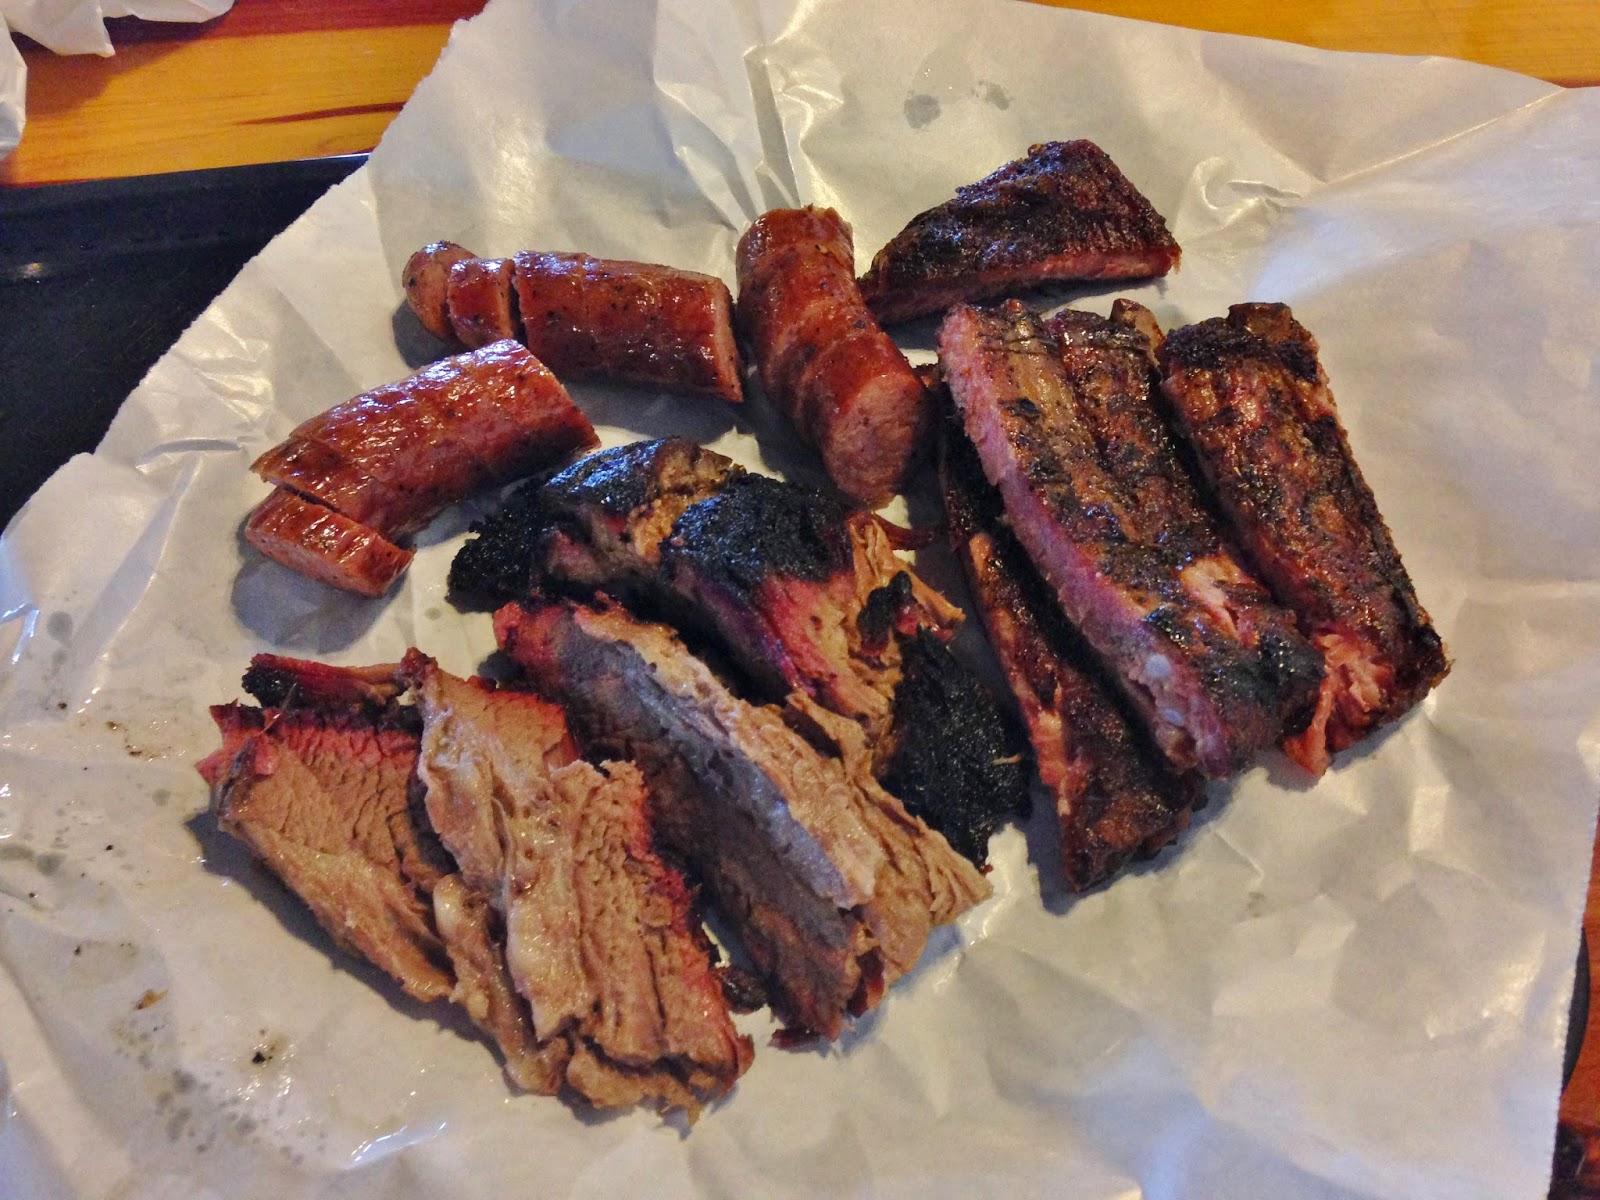 Opie's BBQ: Brisket, Pork Ribs, Sausage